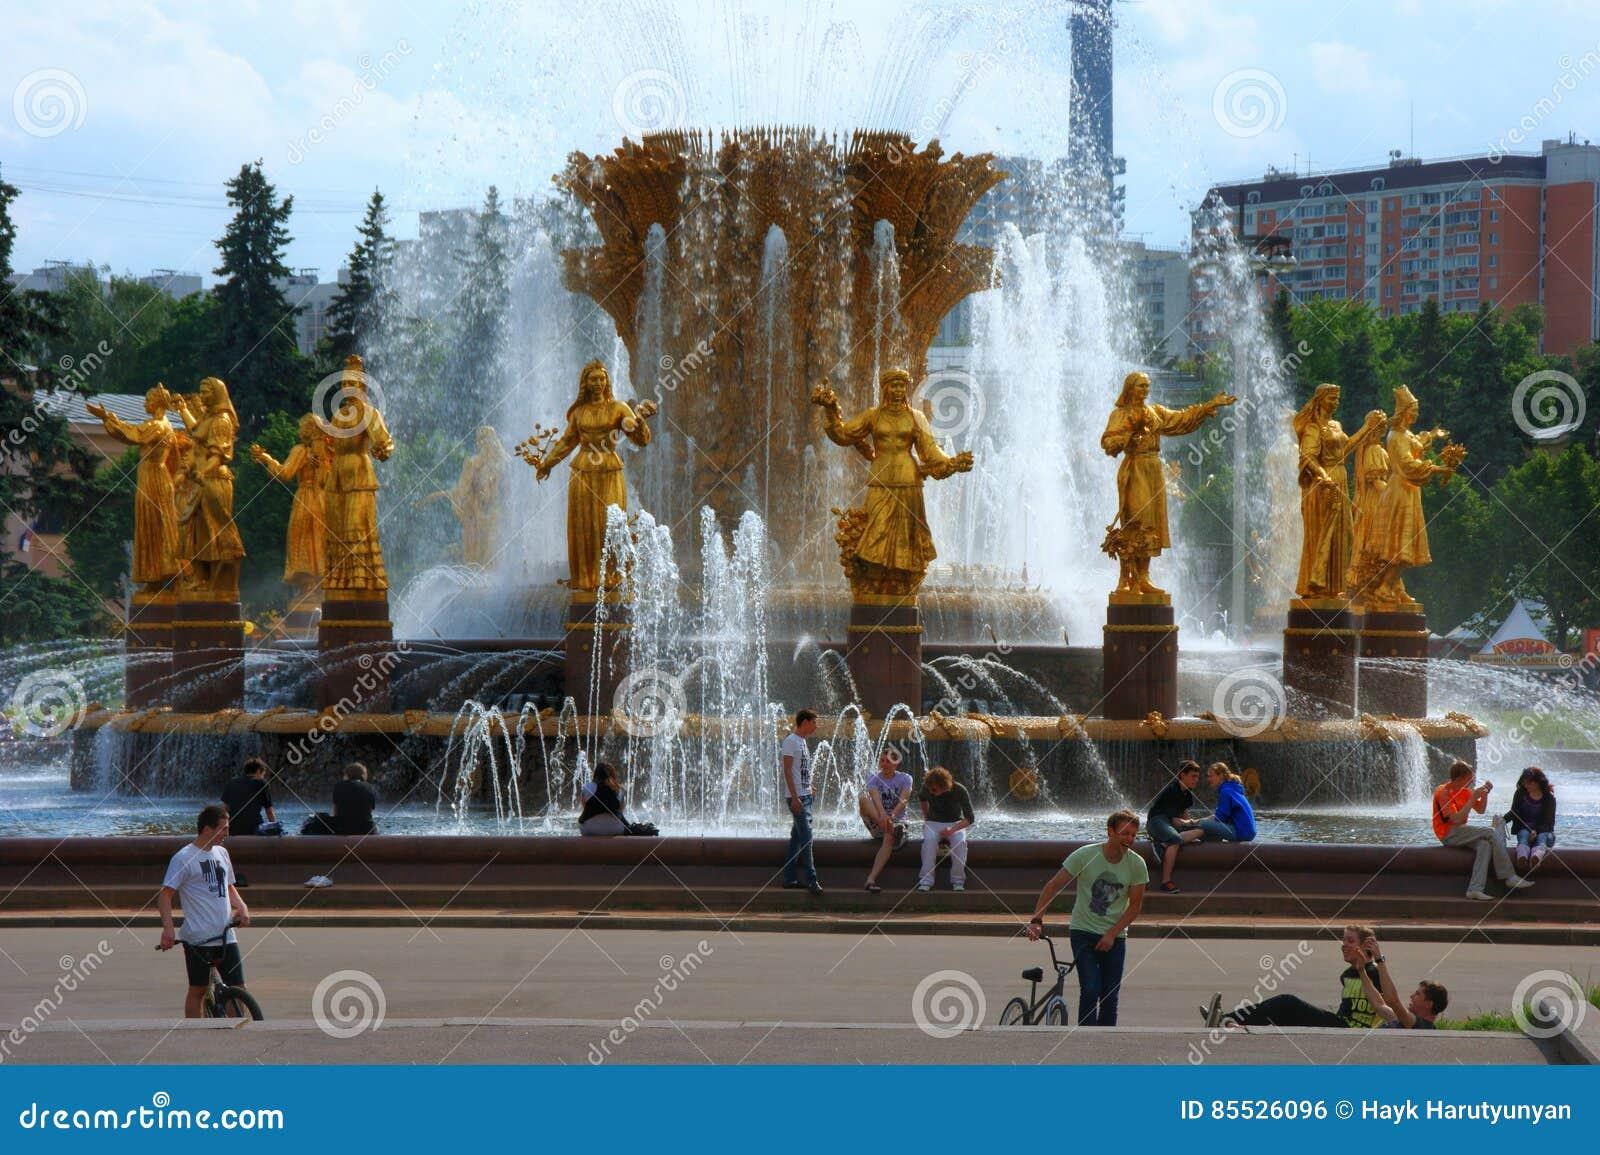 VDNX, Moskau, Russland